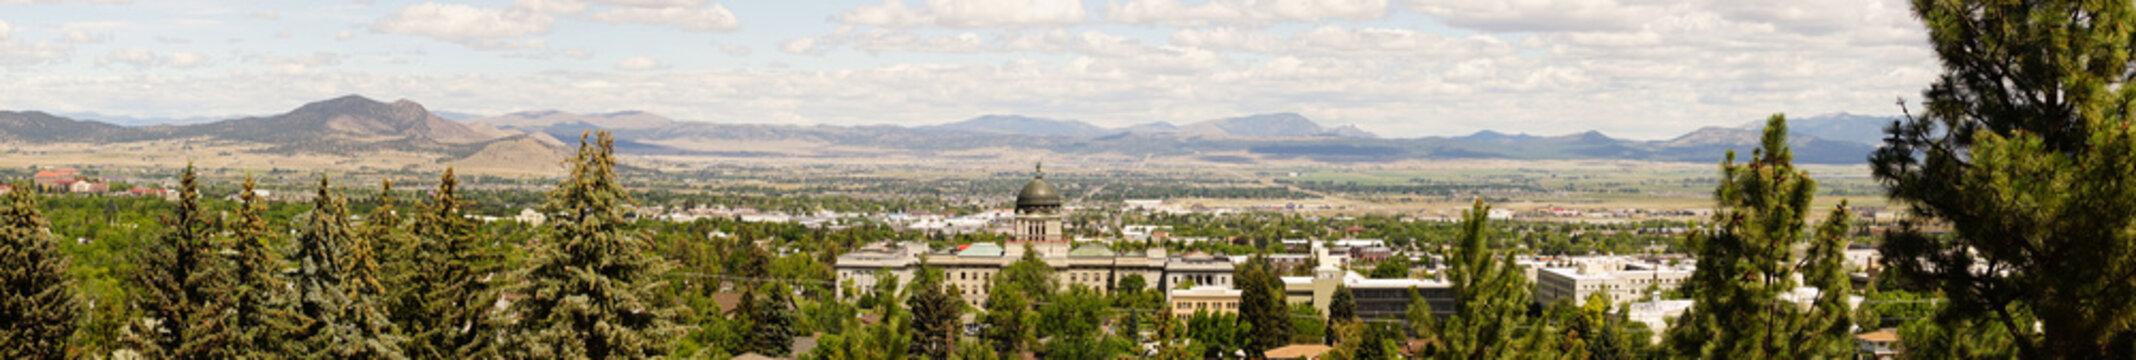 Wide Panoramic Capital Dome Helena Montana State Building